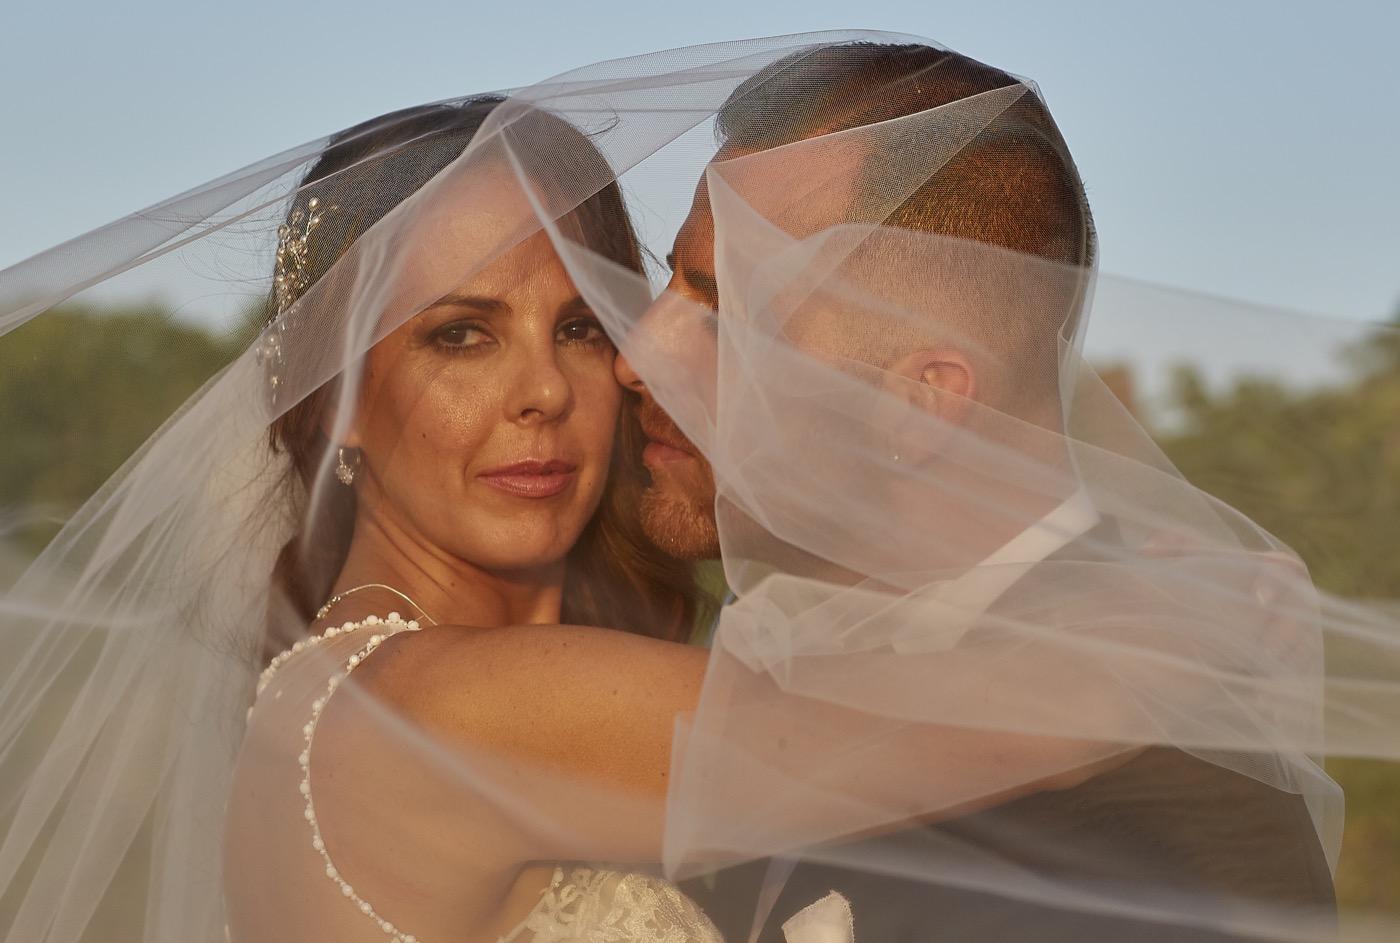 Claudio-Coppola-wedding-photographer-la-scuderia-eventi-preparativi-la-rosetta-perugia-75